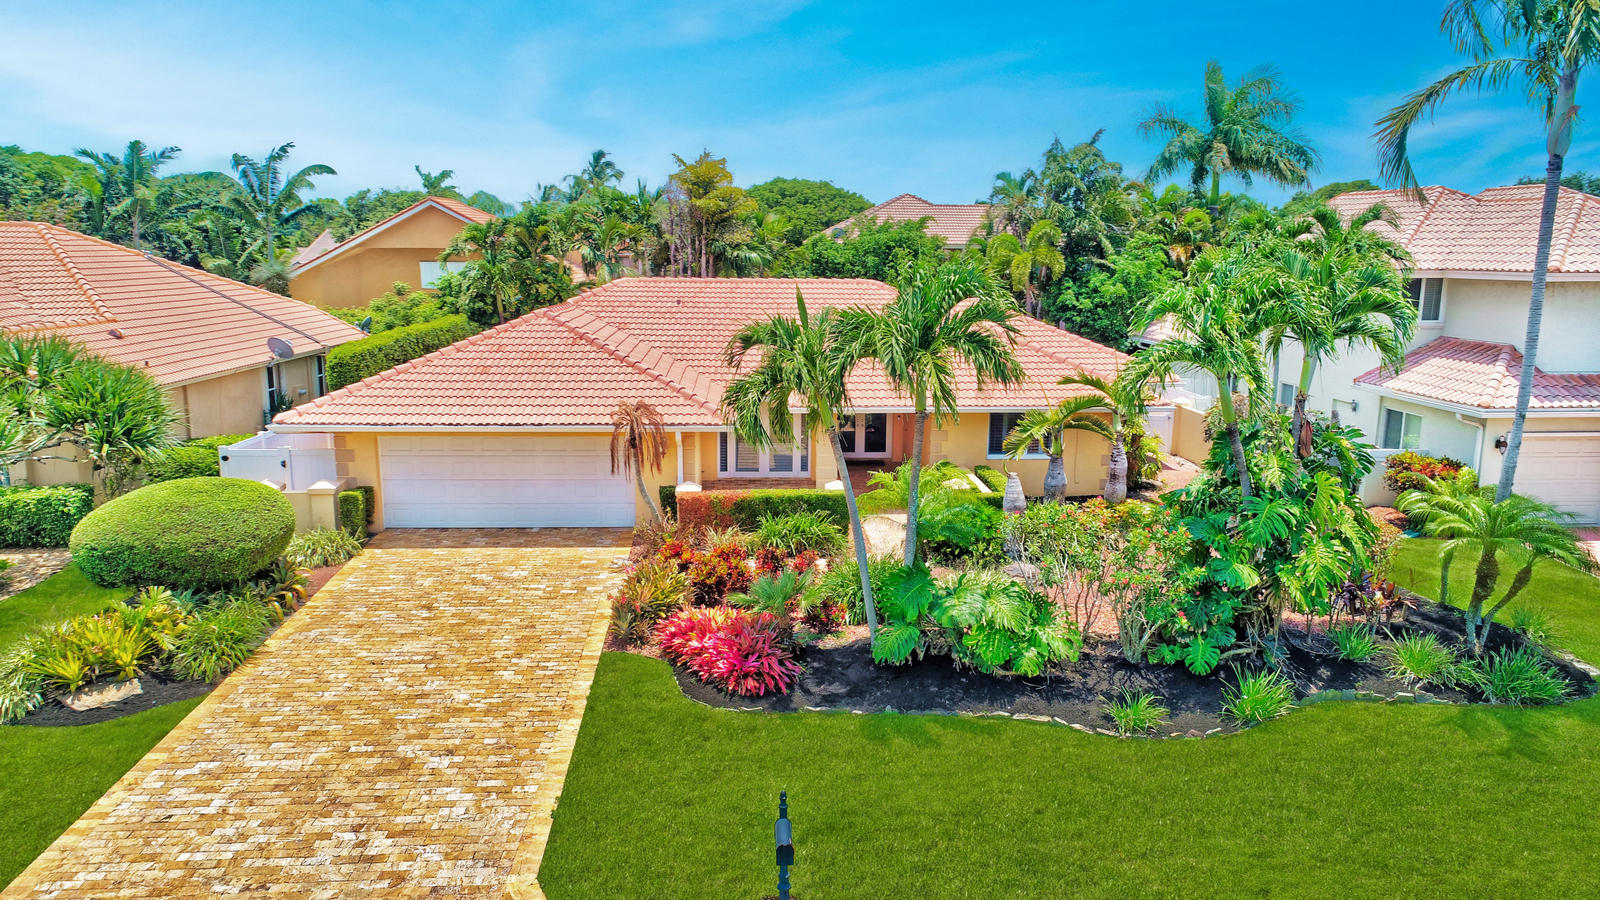 6155 Vista Linda Lane  Boca Raton, FL 33433